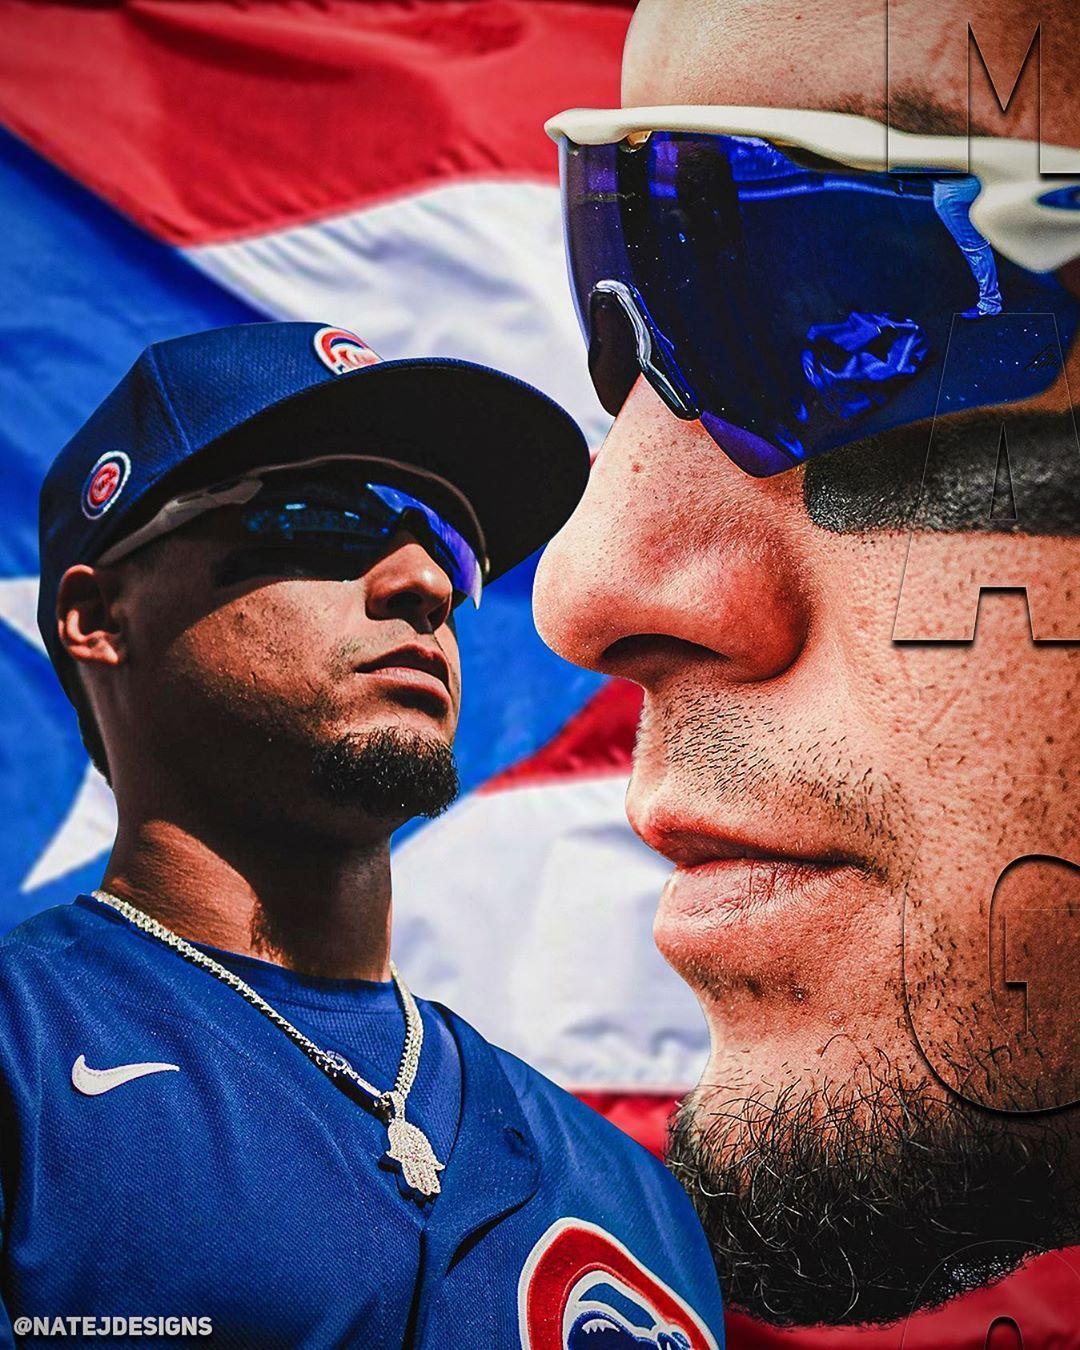 Nathaniel Ramos On Instagram Javy23baez Javierbaez In 2020 Chicago Cubs Baseball Cubs Baseball Chicago Cubs